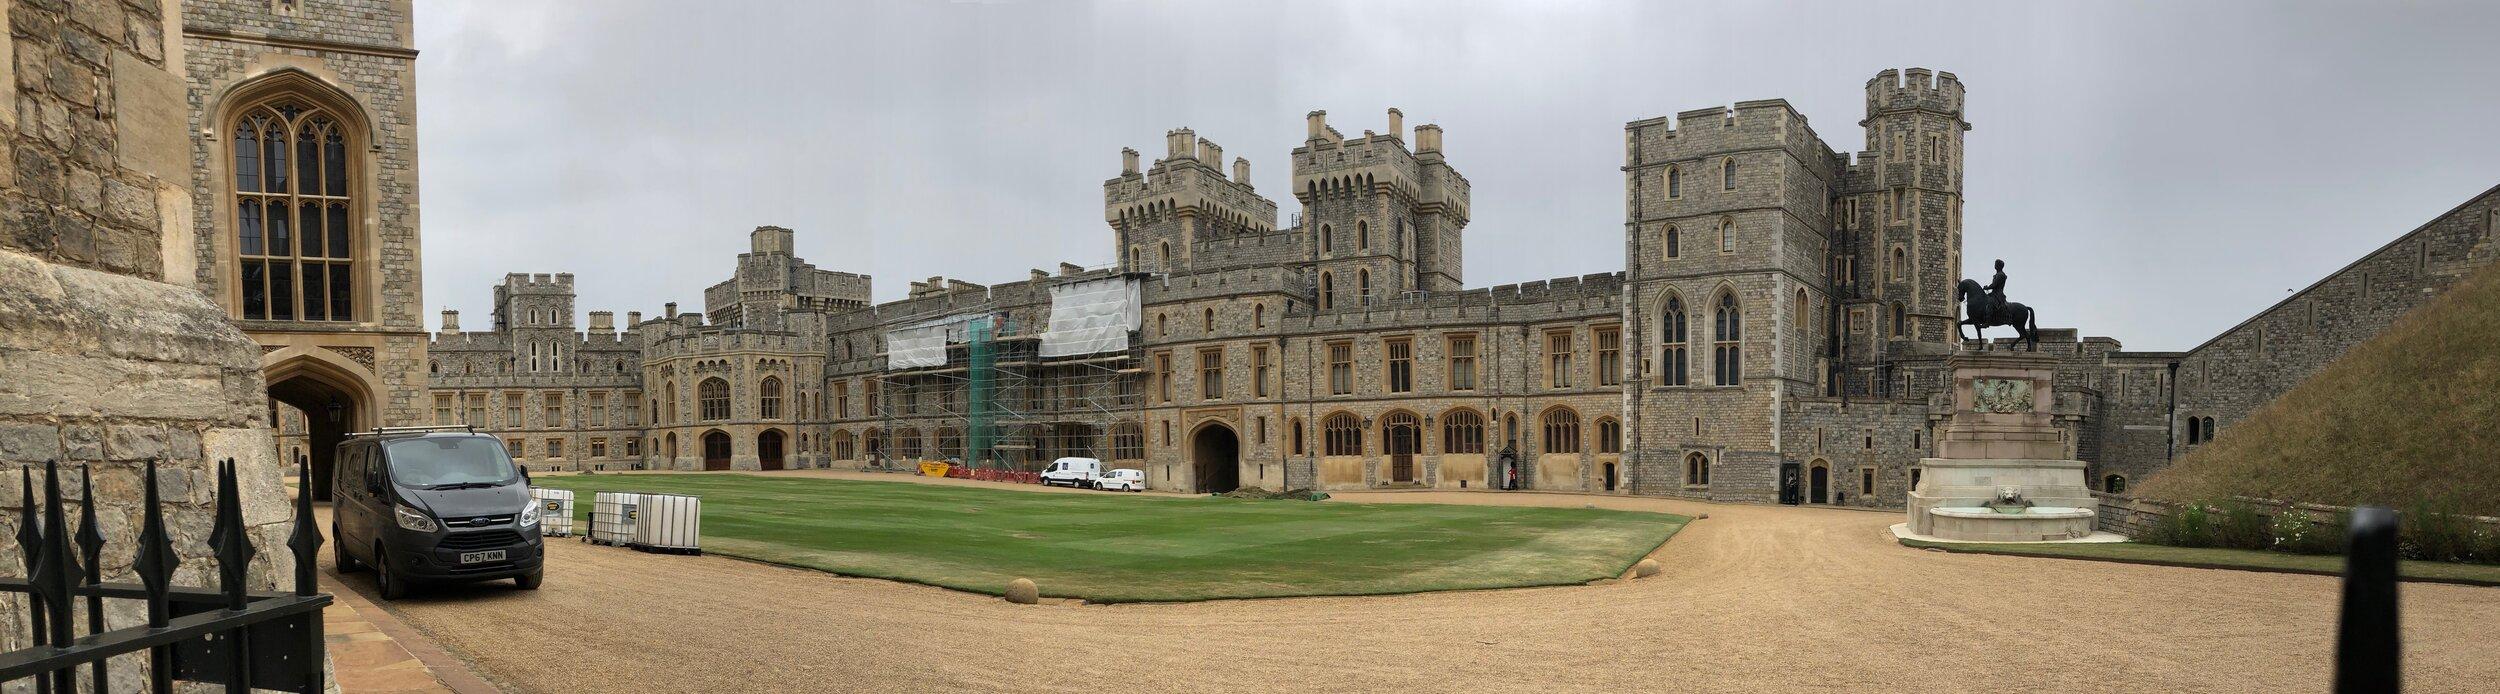 Windsor Castle, London UK